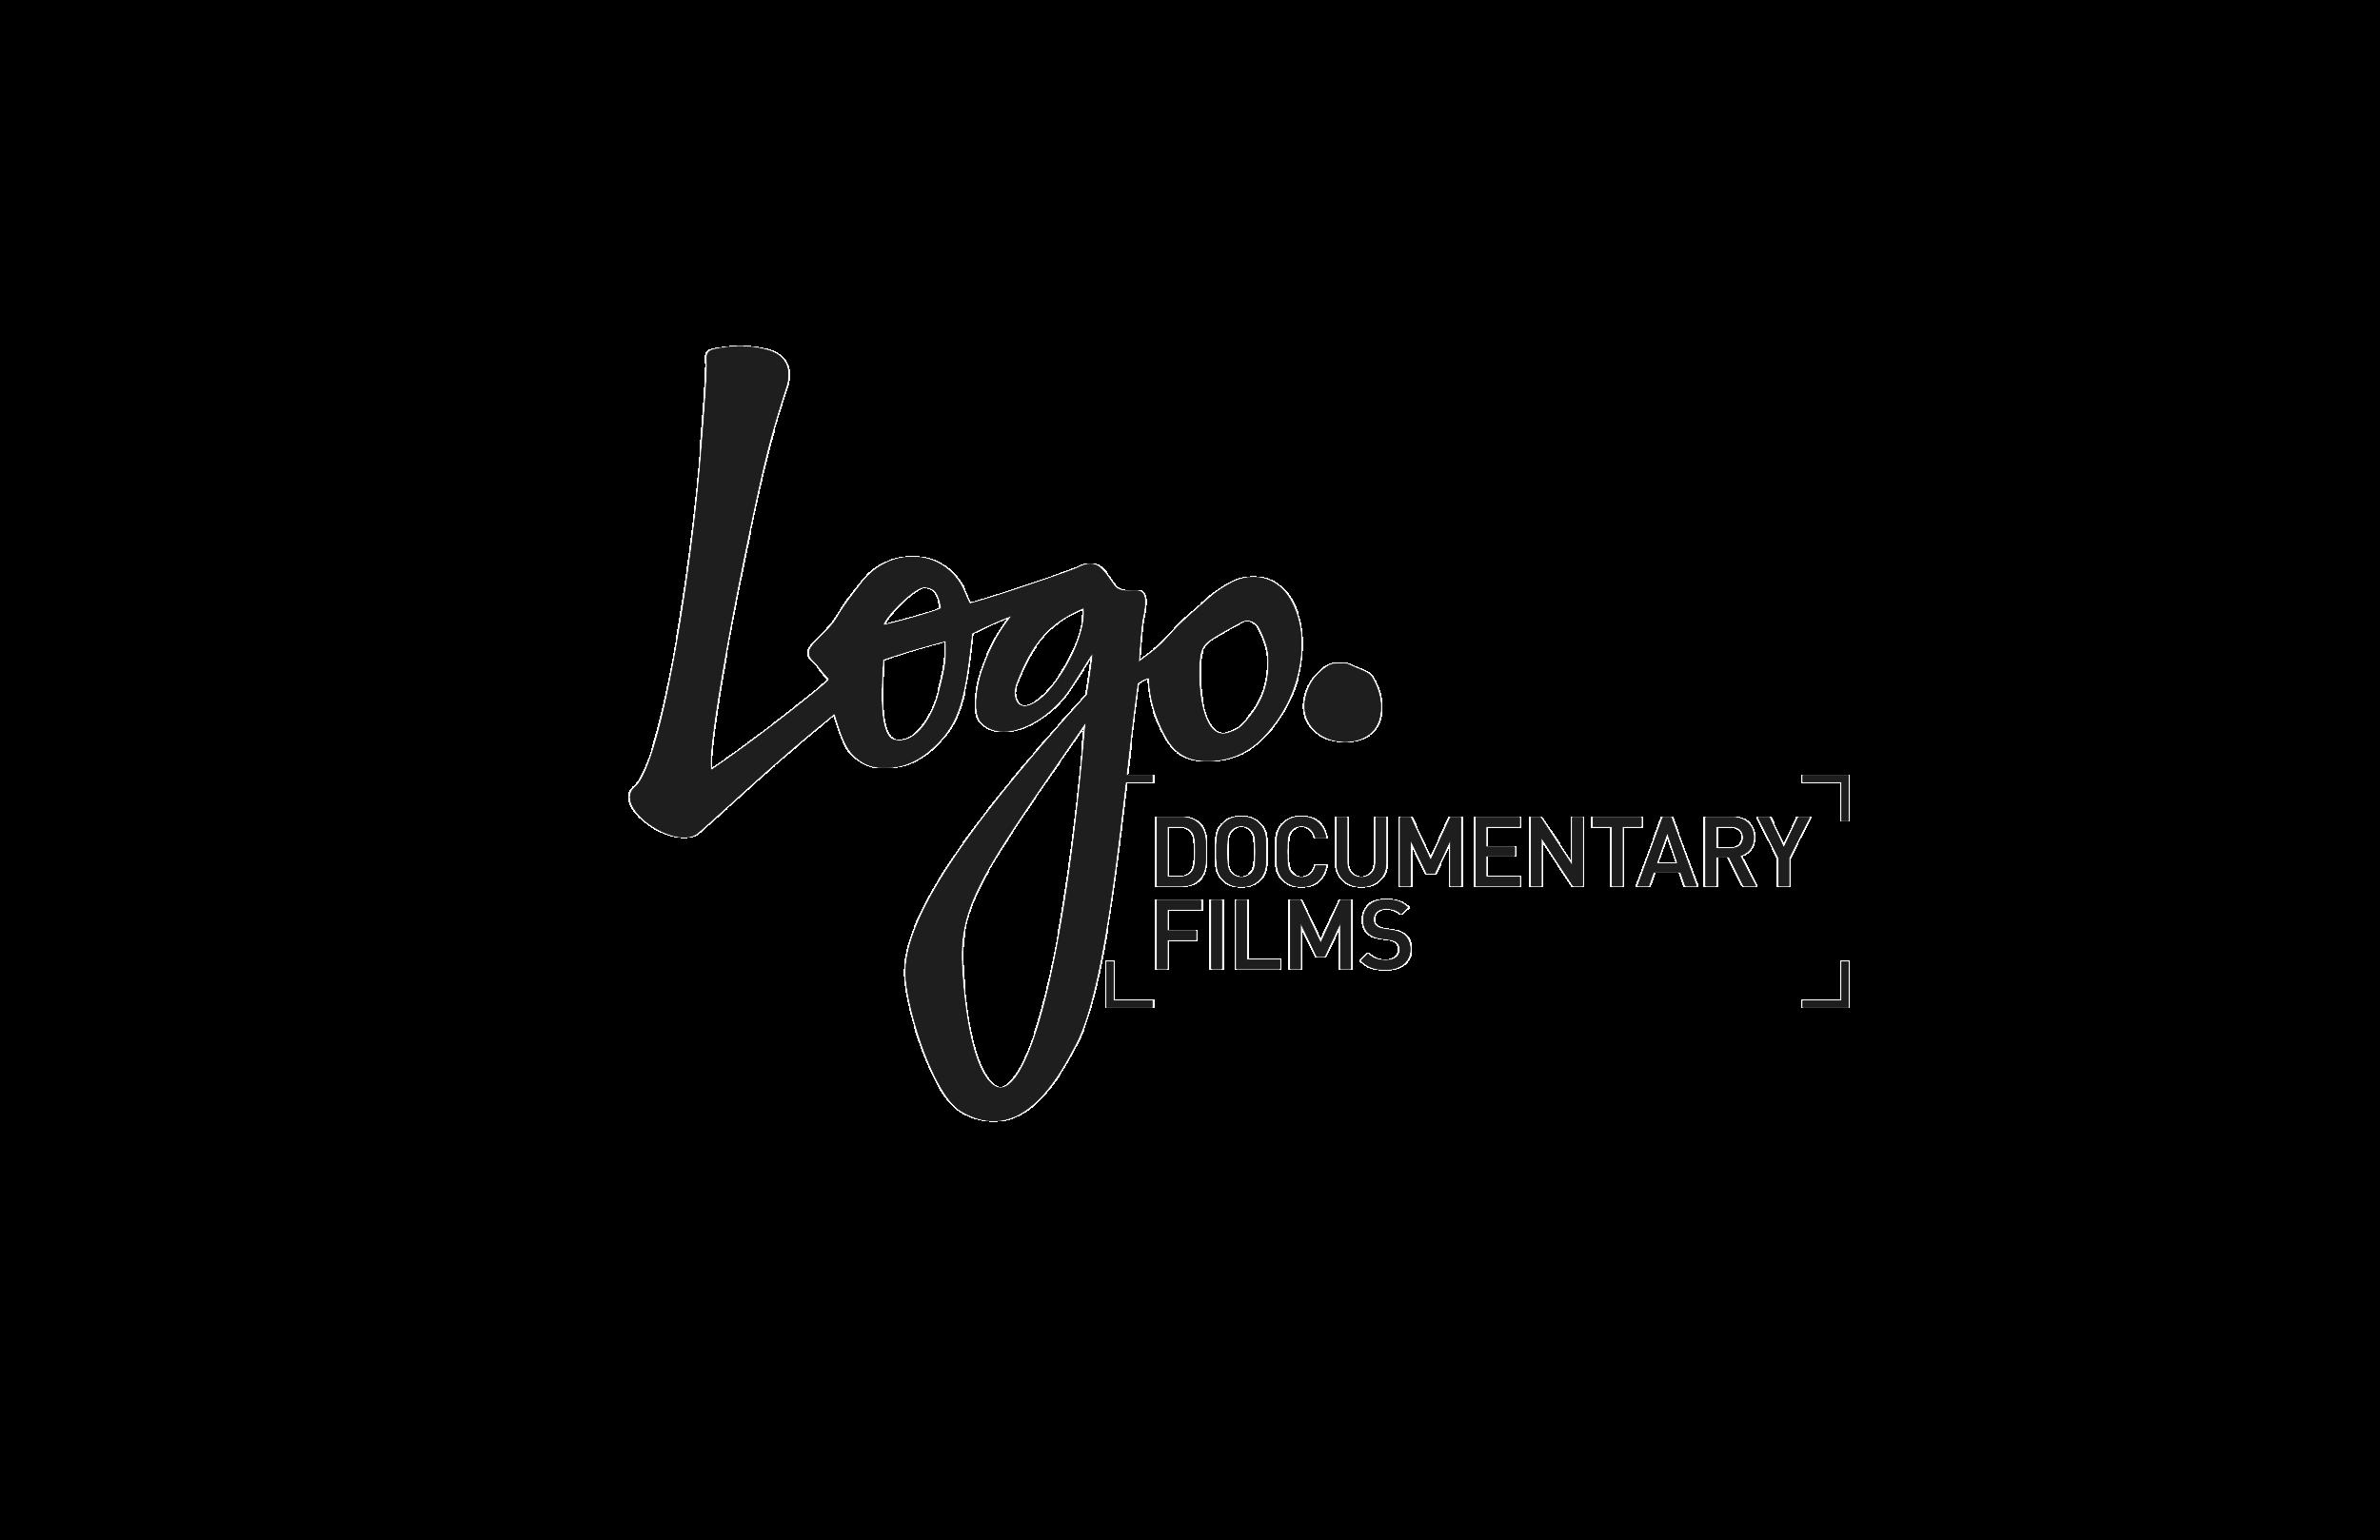 Logo_Docs_logo-01.png